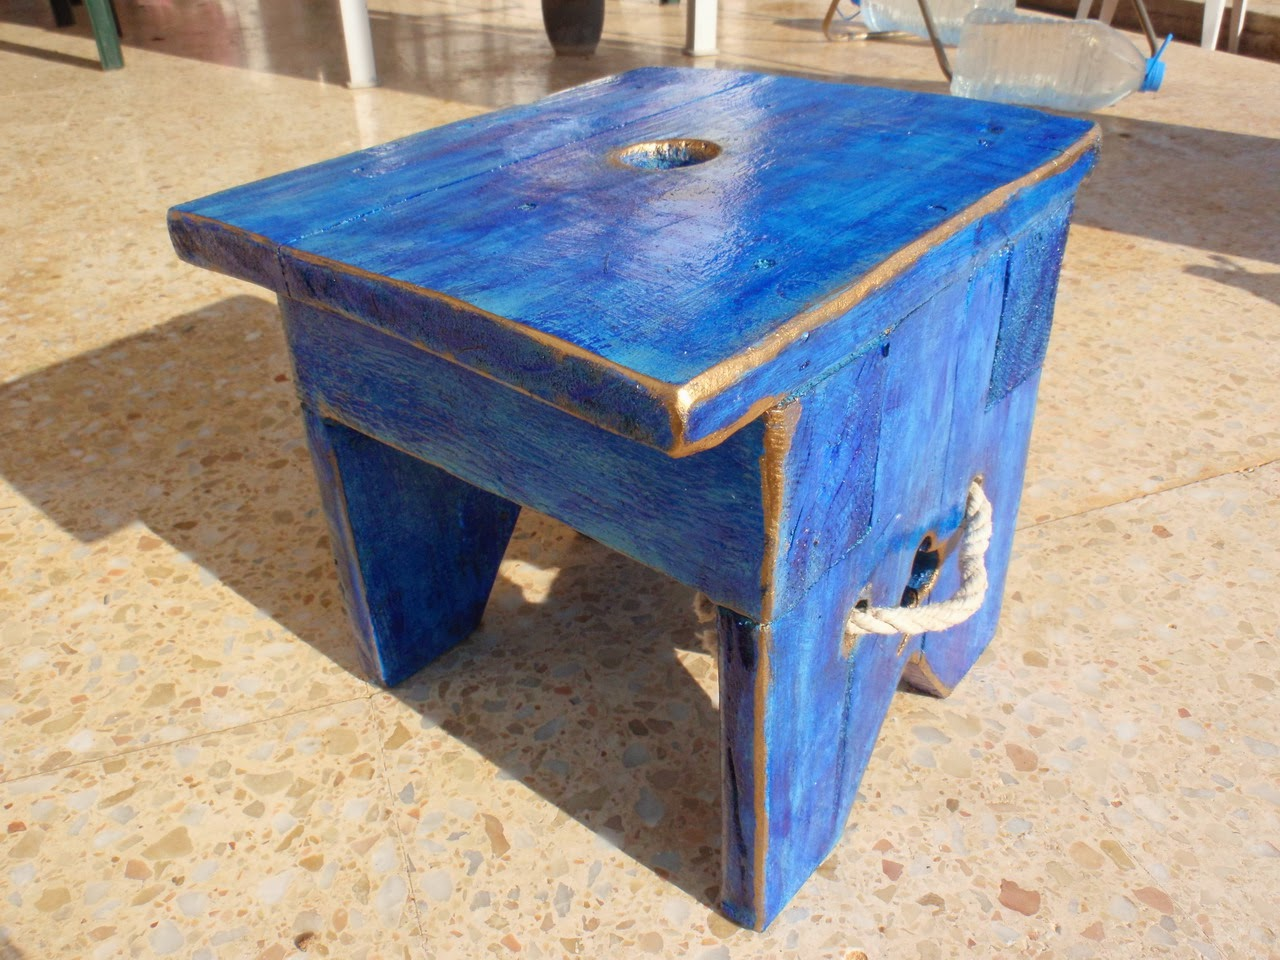 Taburete banqueta r stico azul for Taburetes de madera rusticos